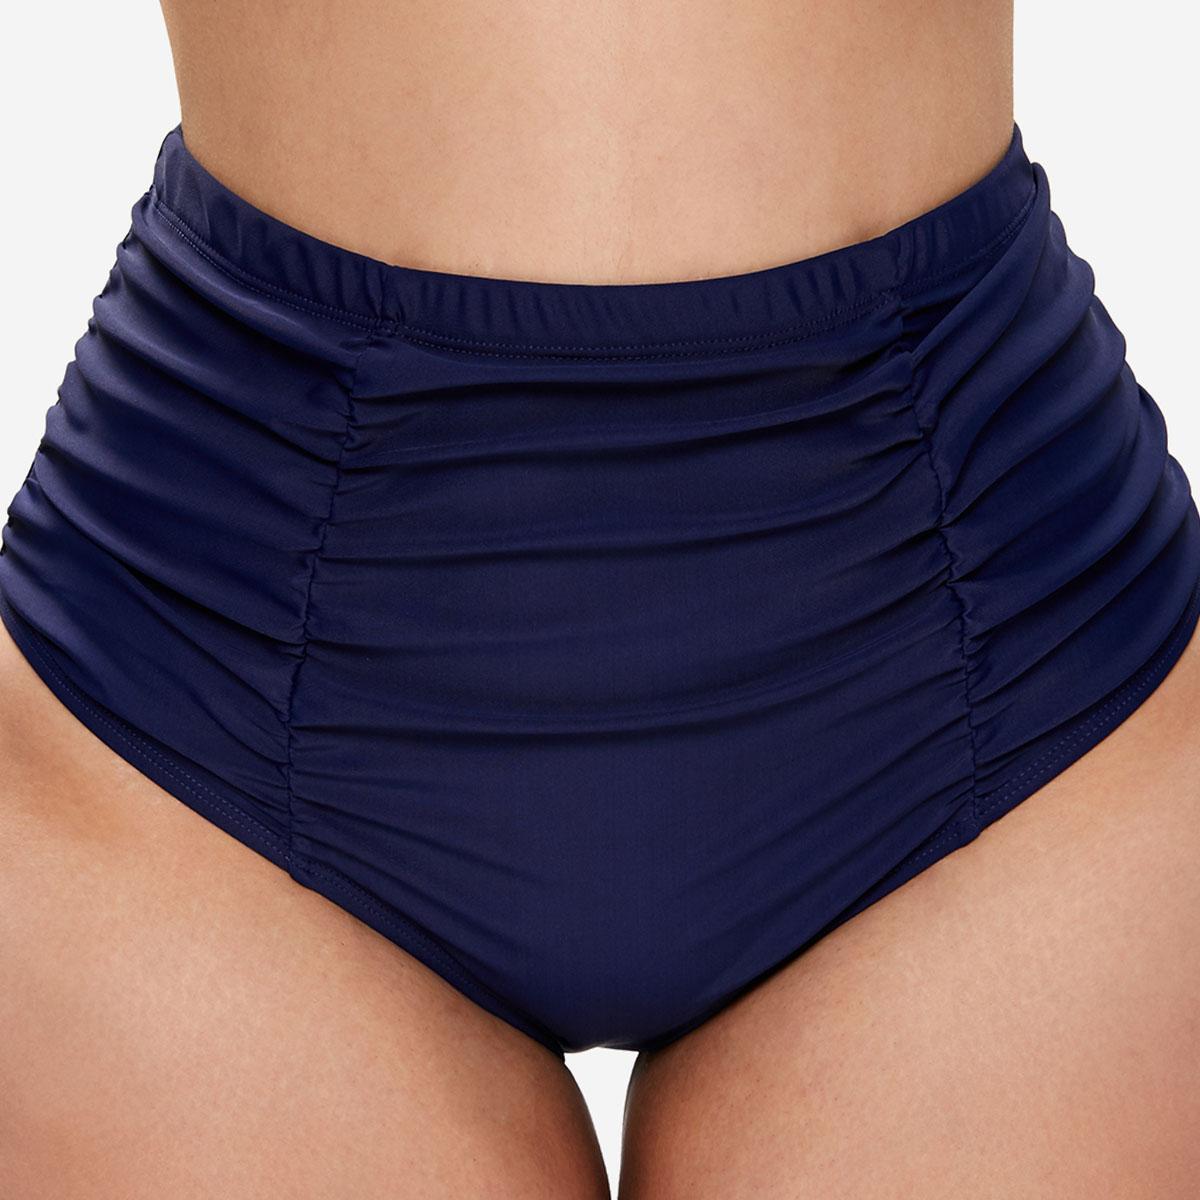 Ruched High Waist Plus Size Swimwear Panty